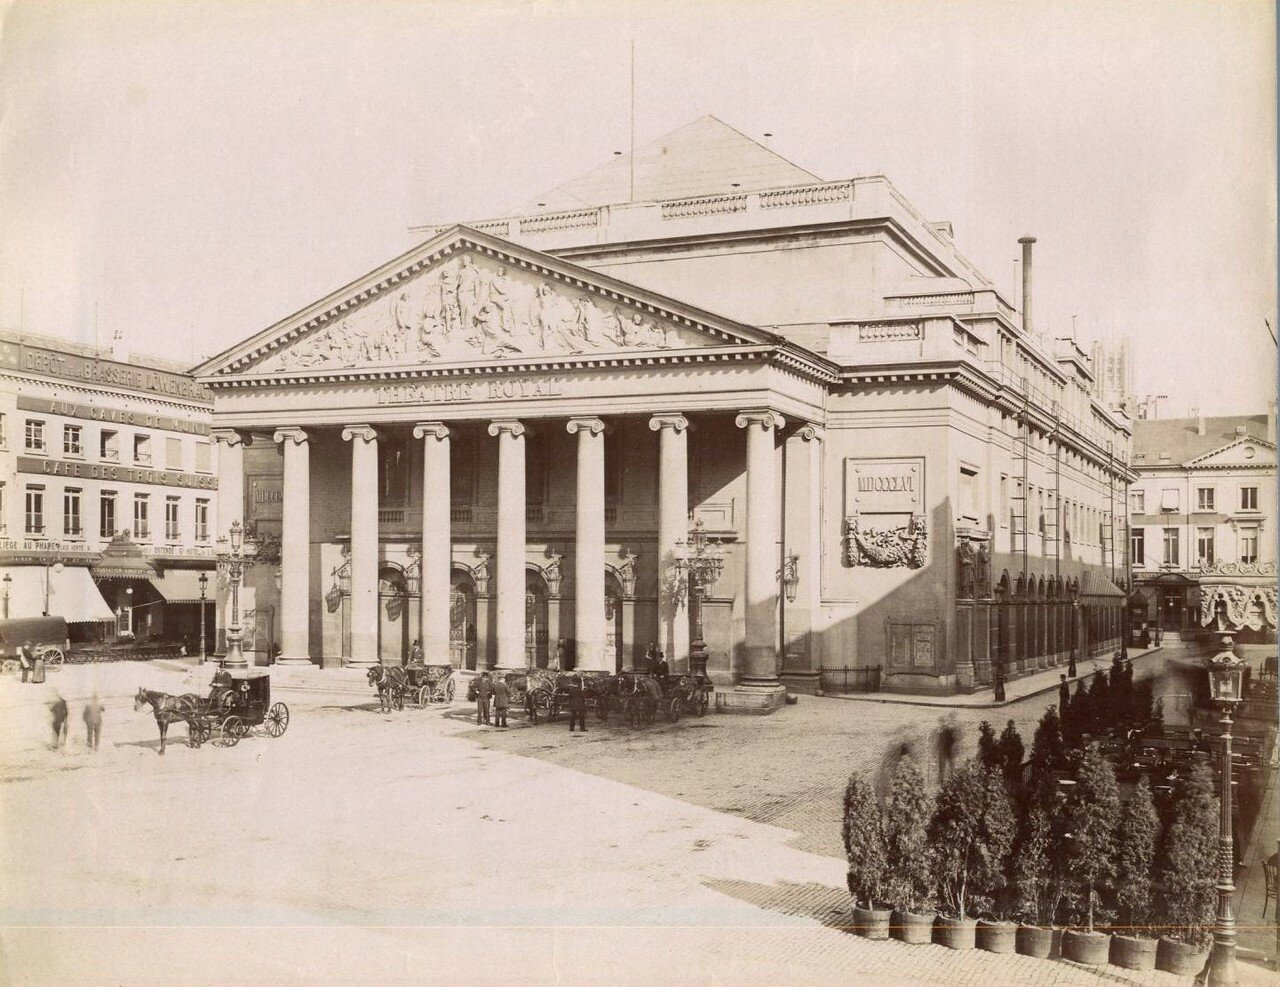 Королевский оперный театр де ла Монне